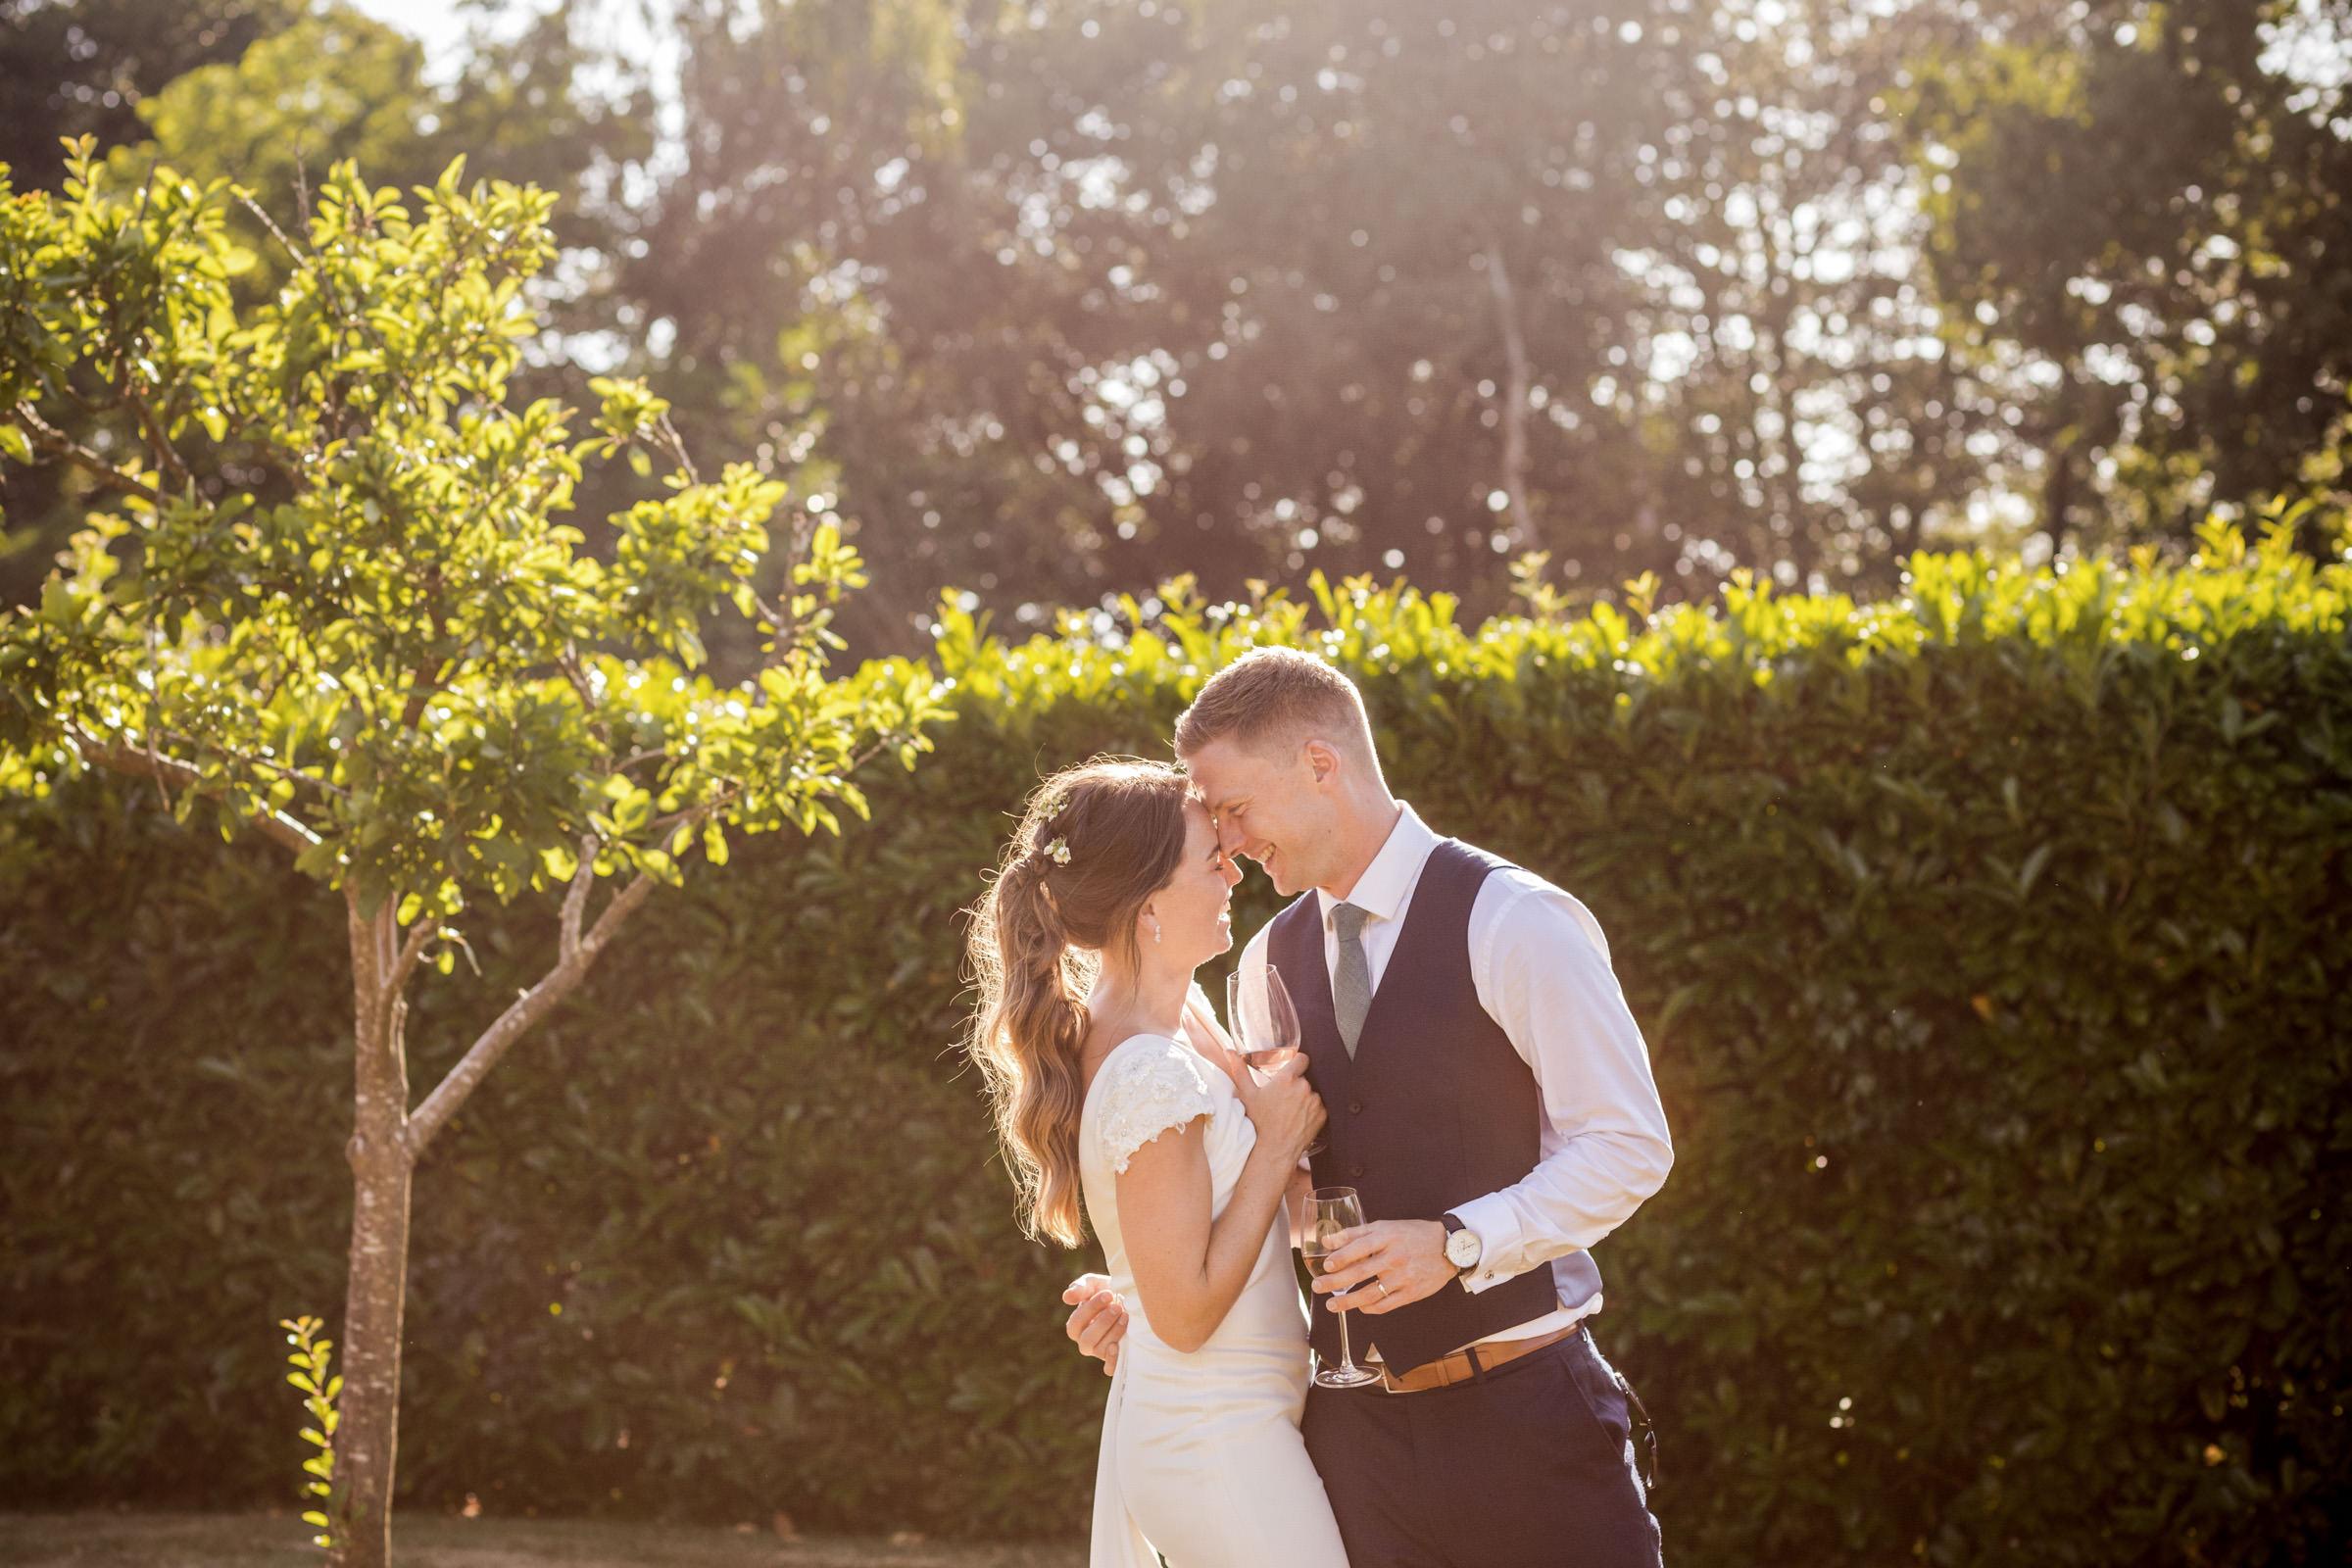 Wedding Photography in Ewshot Surrey 043.jpg